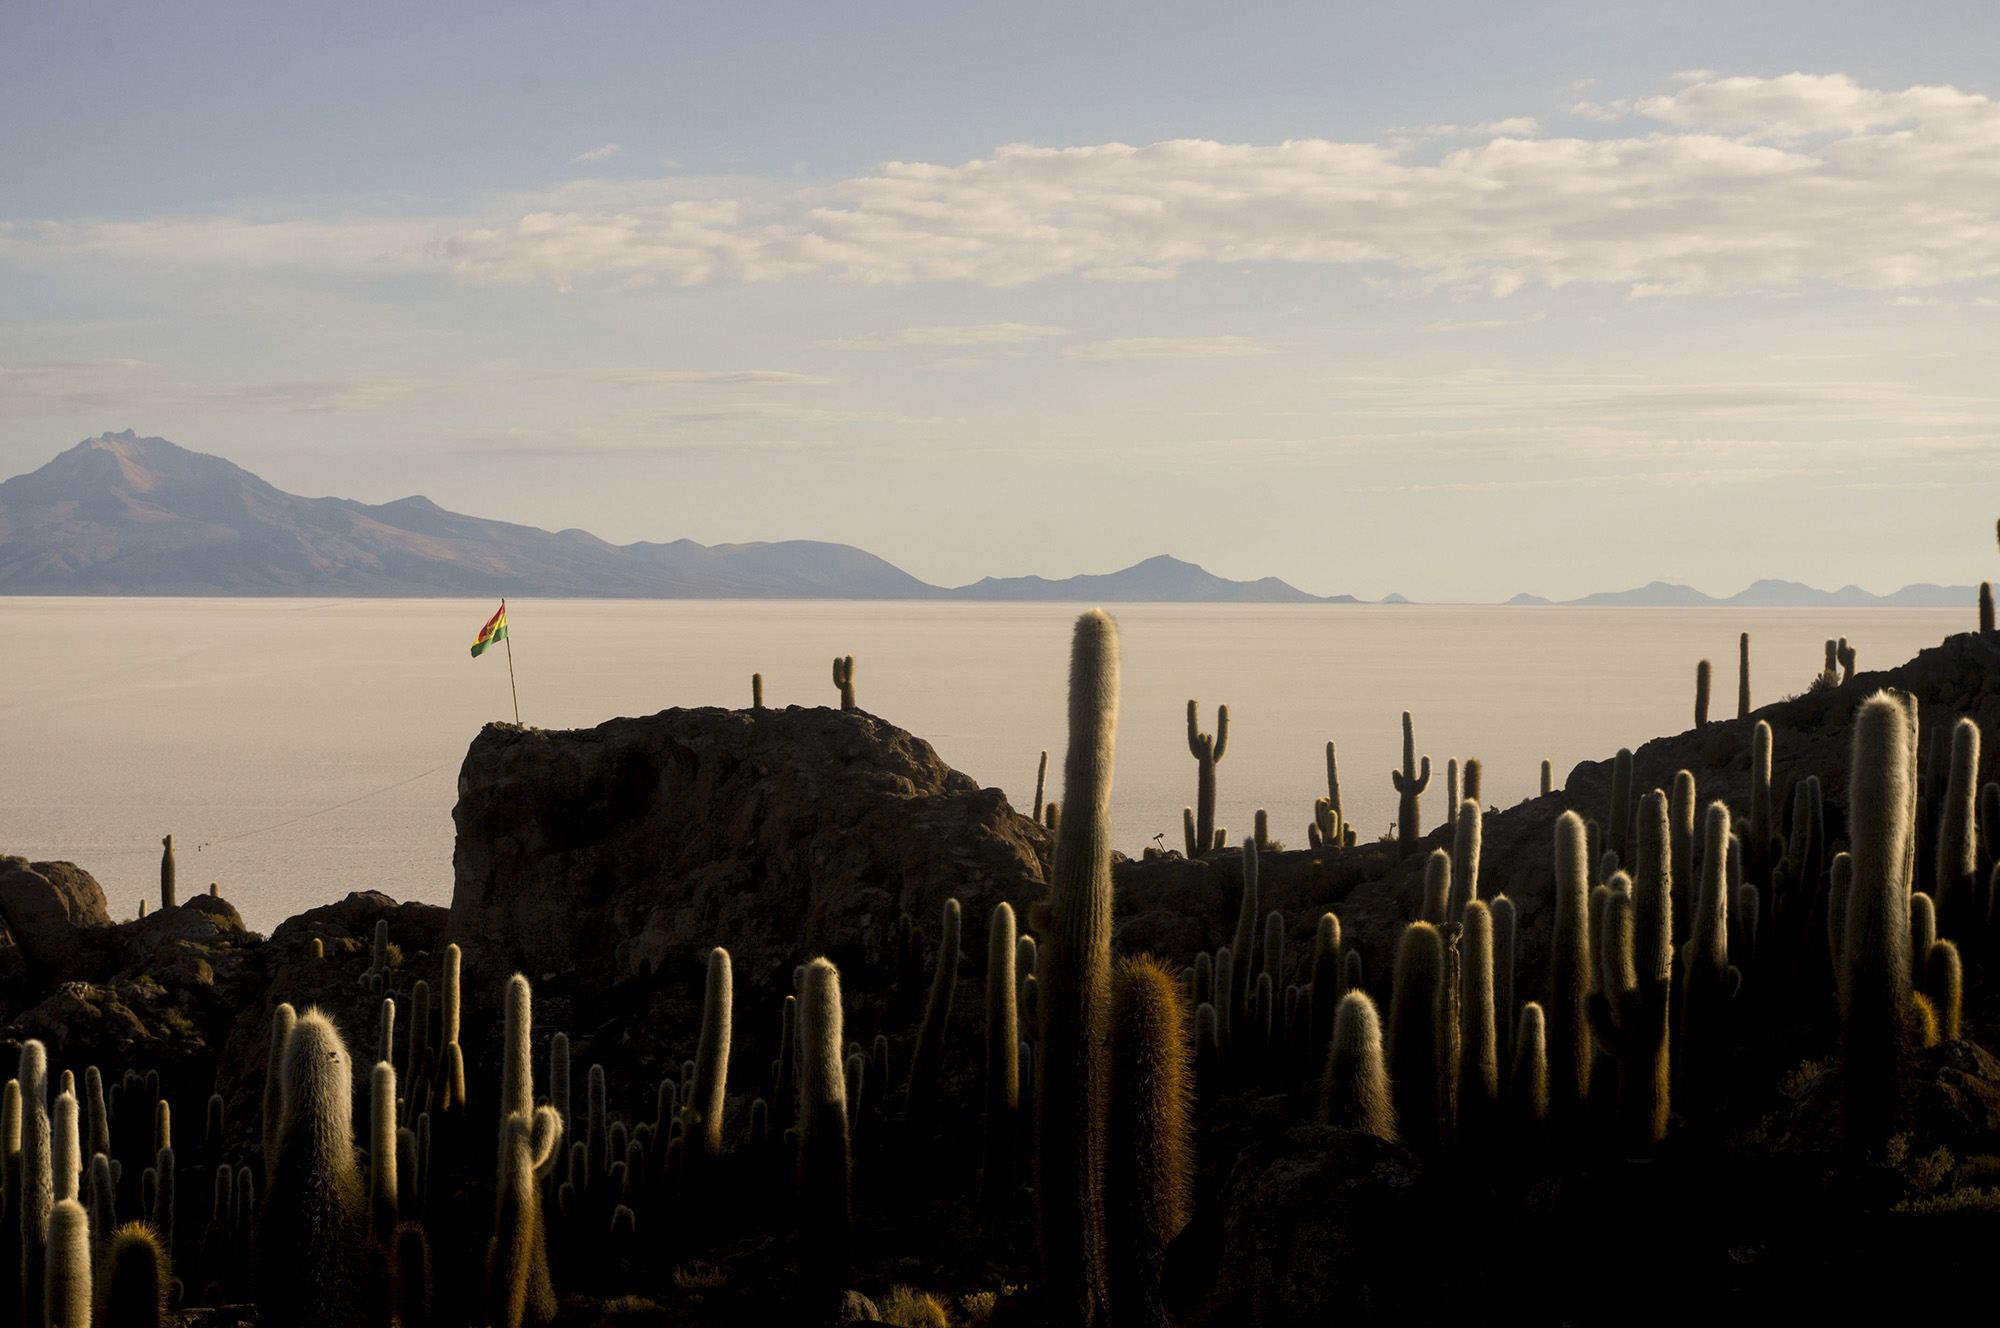 Bolivian Landscapes 1